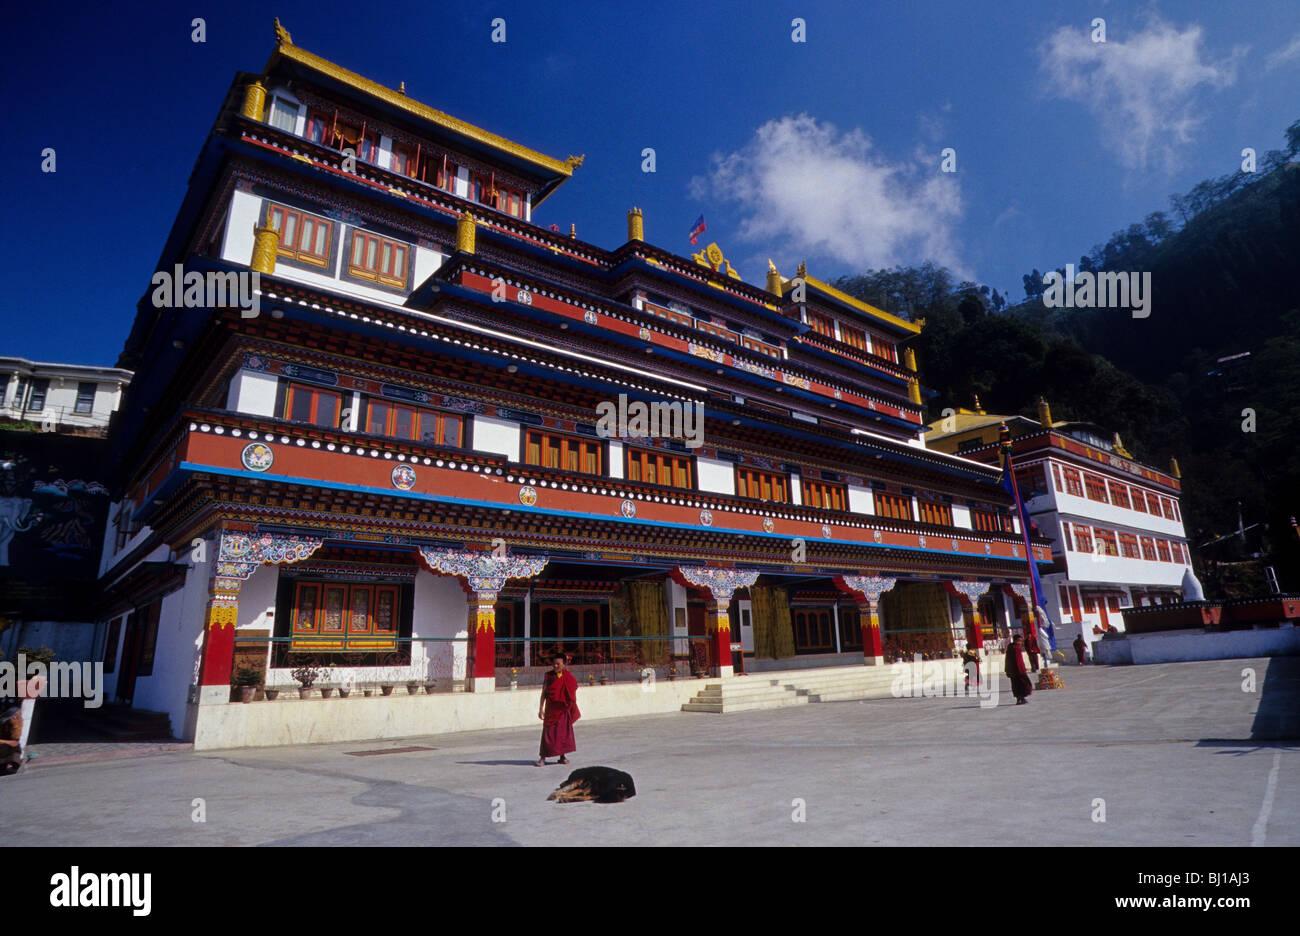 Tibetan Monastery In The Himalaya Just Outside Of Darjeeling West